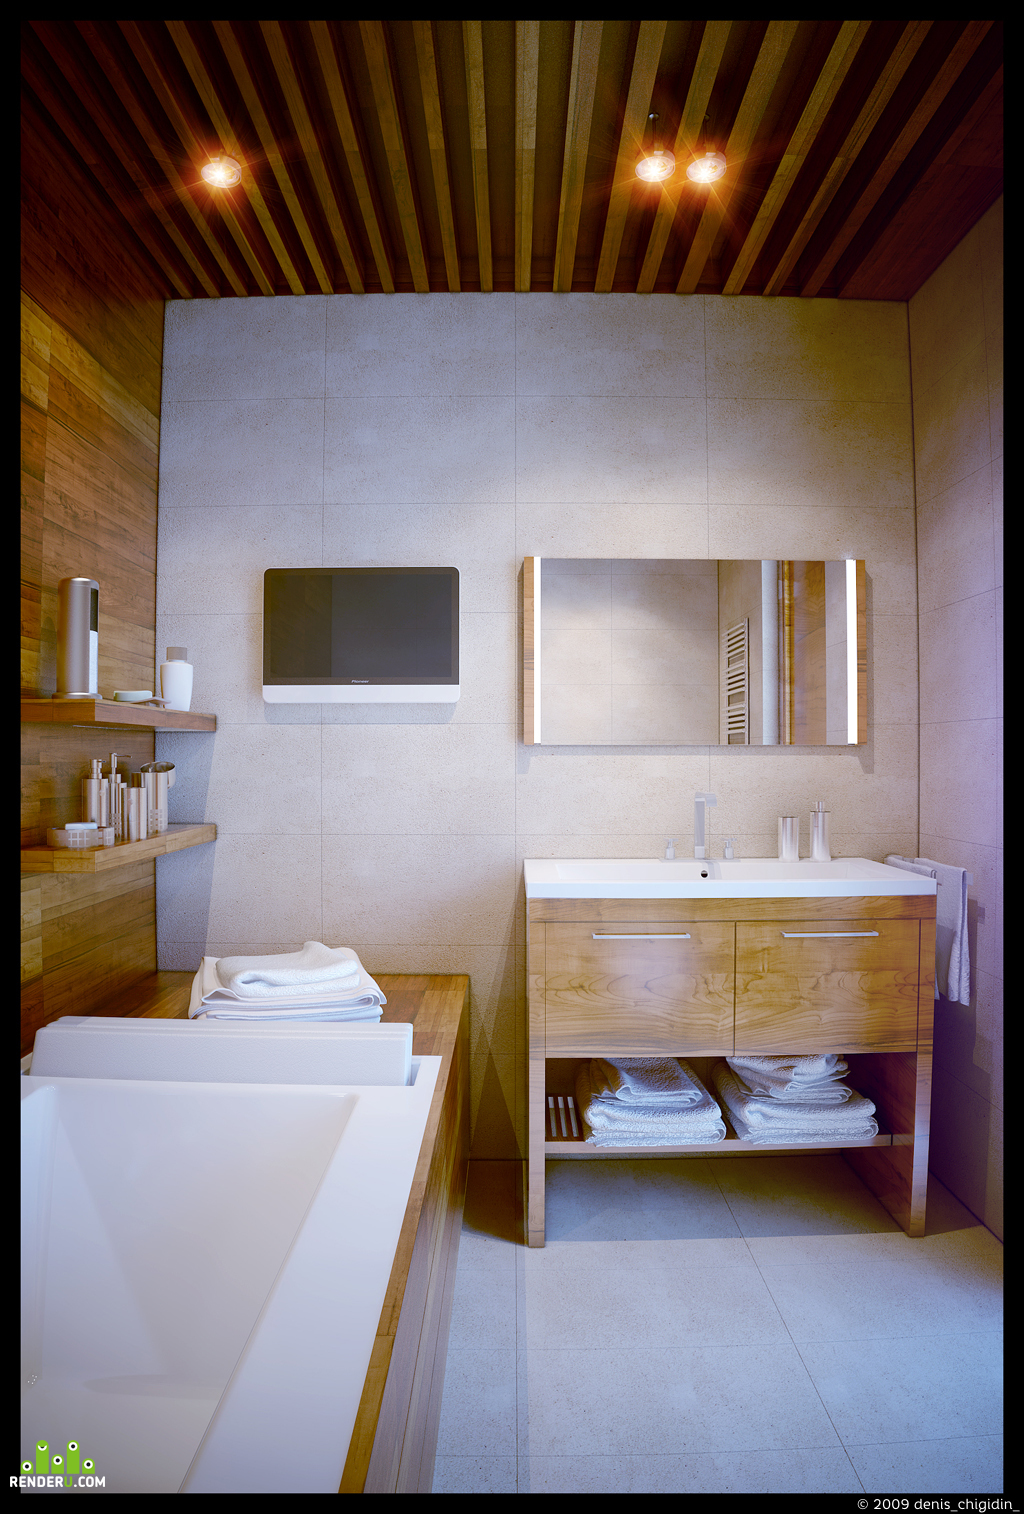 preview Bathroom.